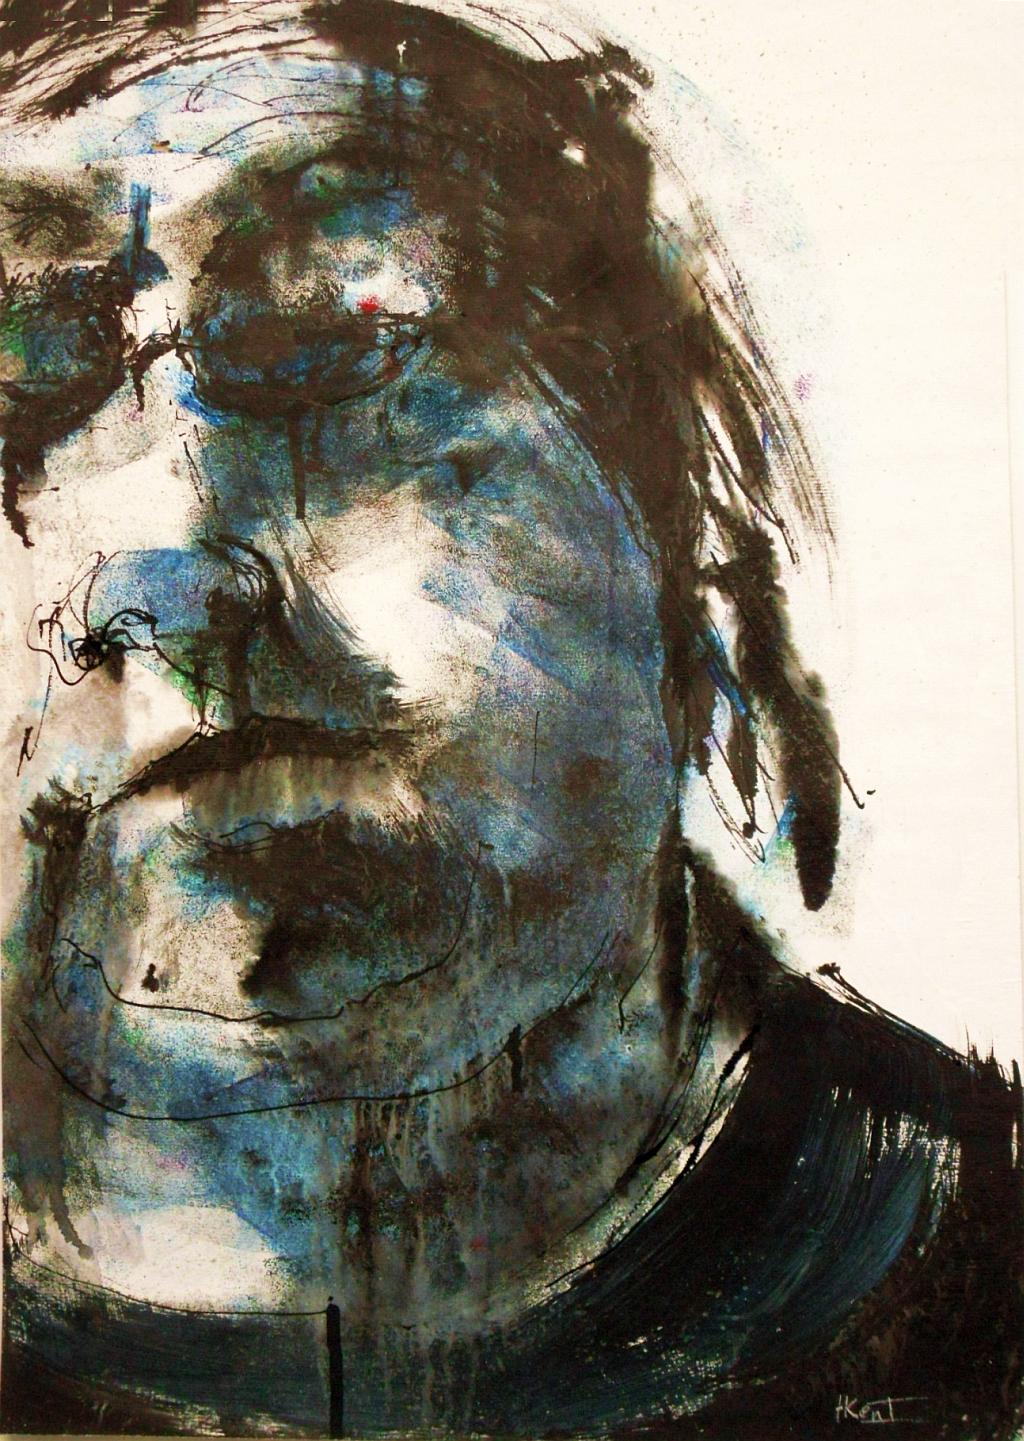 Tachisme Harry Kent Drawings Of Self